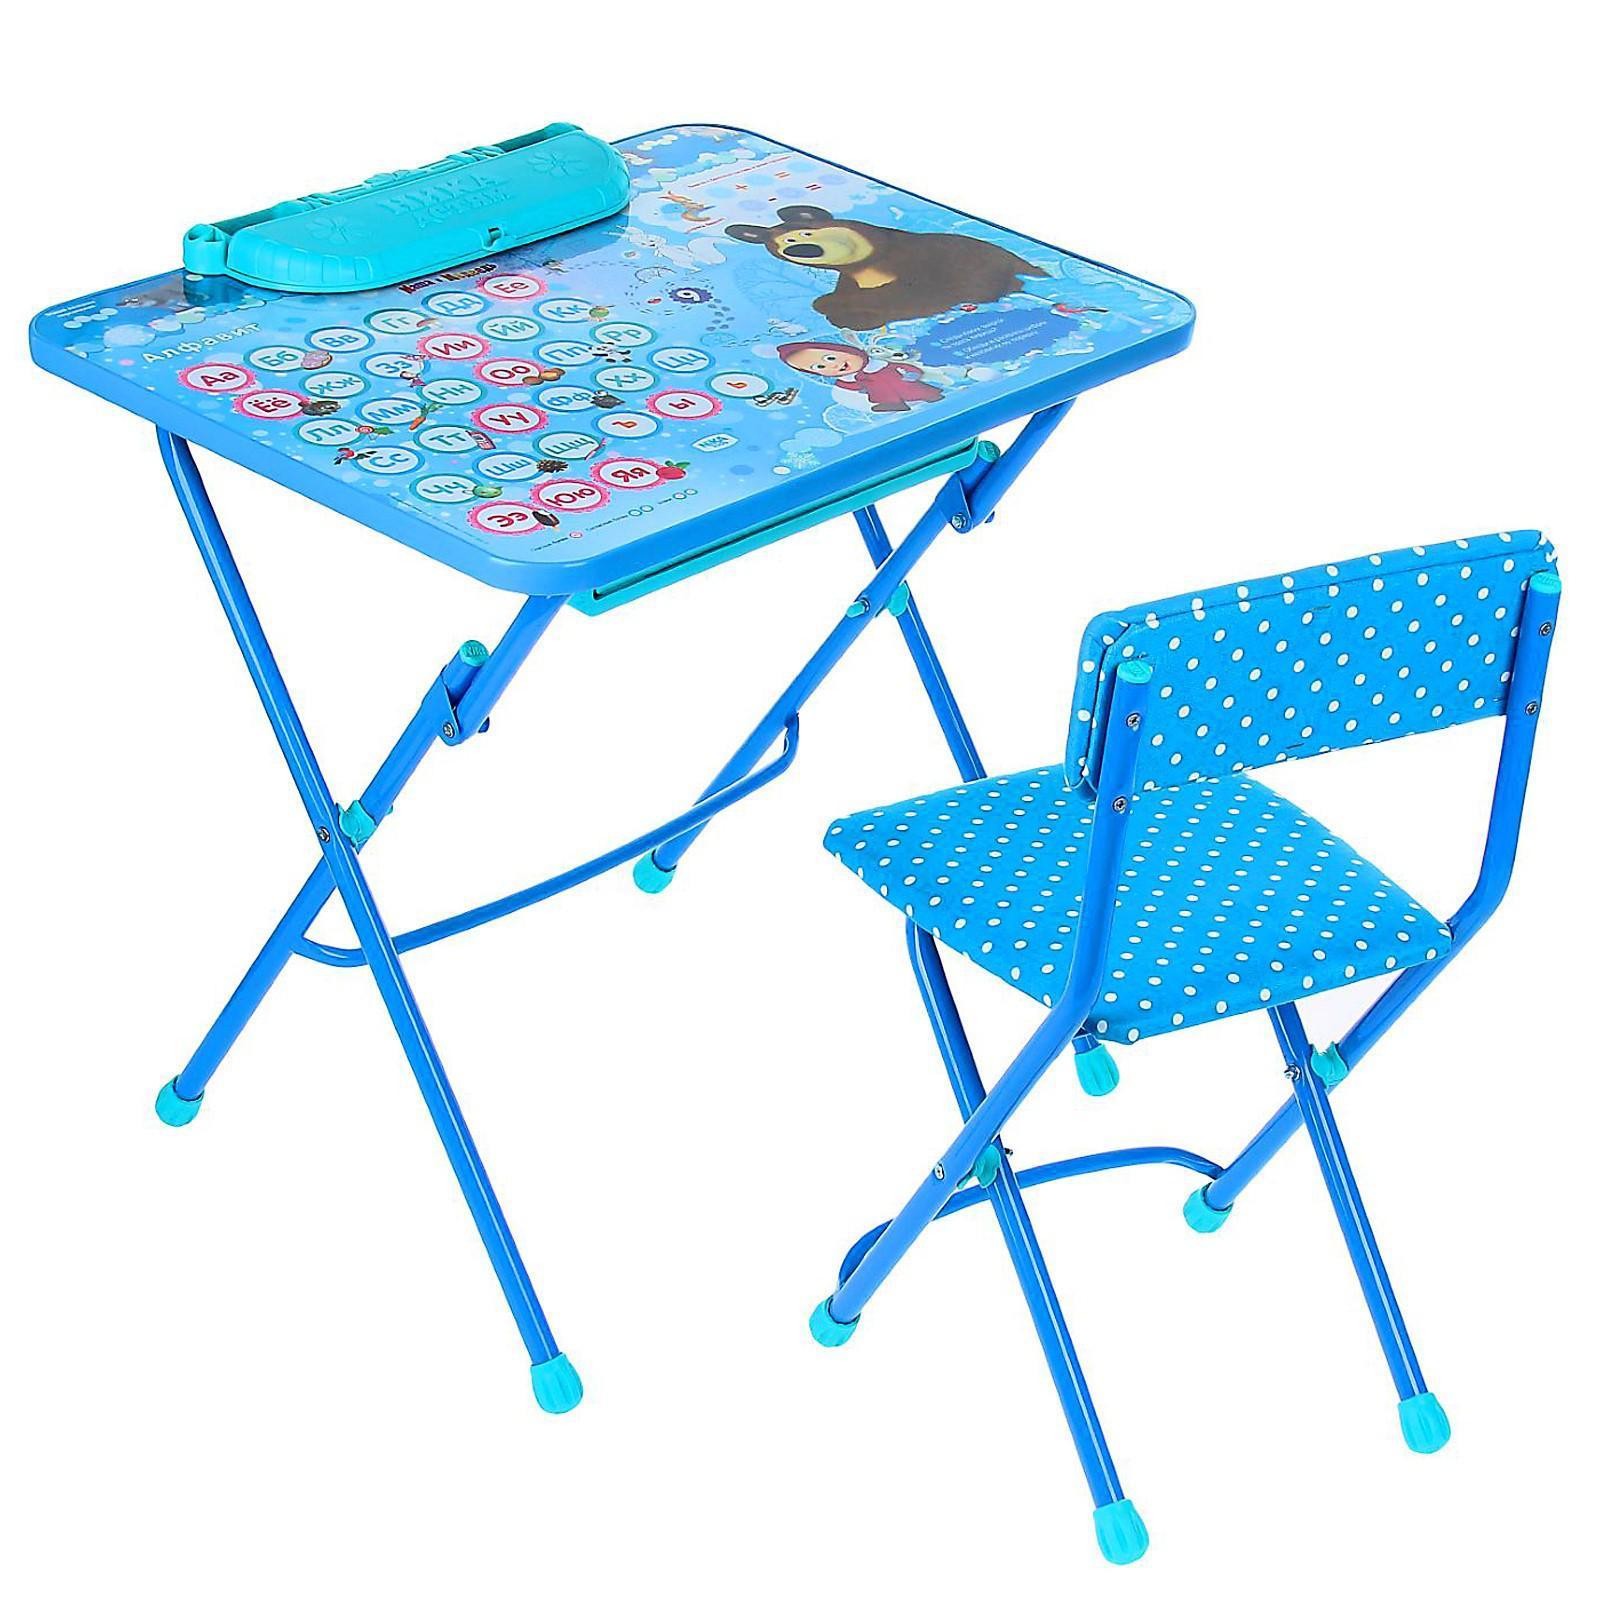 набор мебели азбука4маша и медведь стол пеналстул 2073110